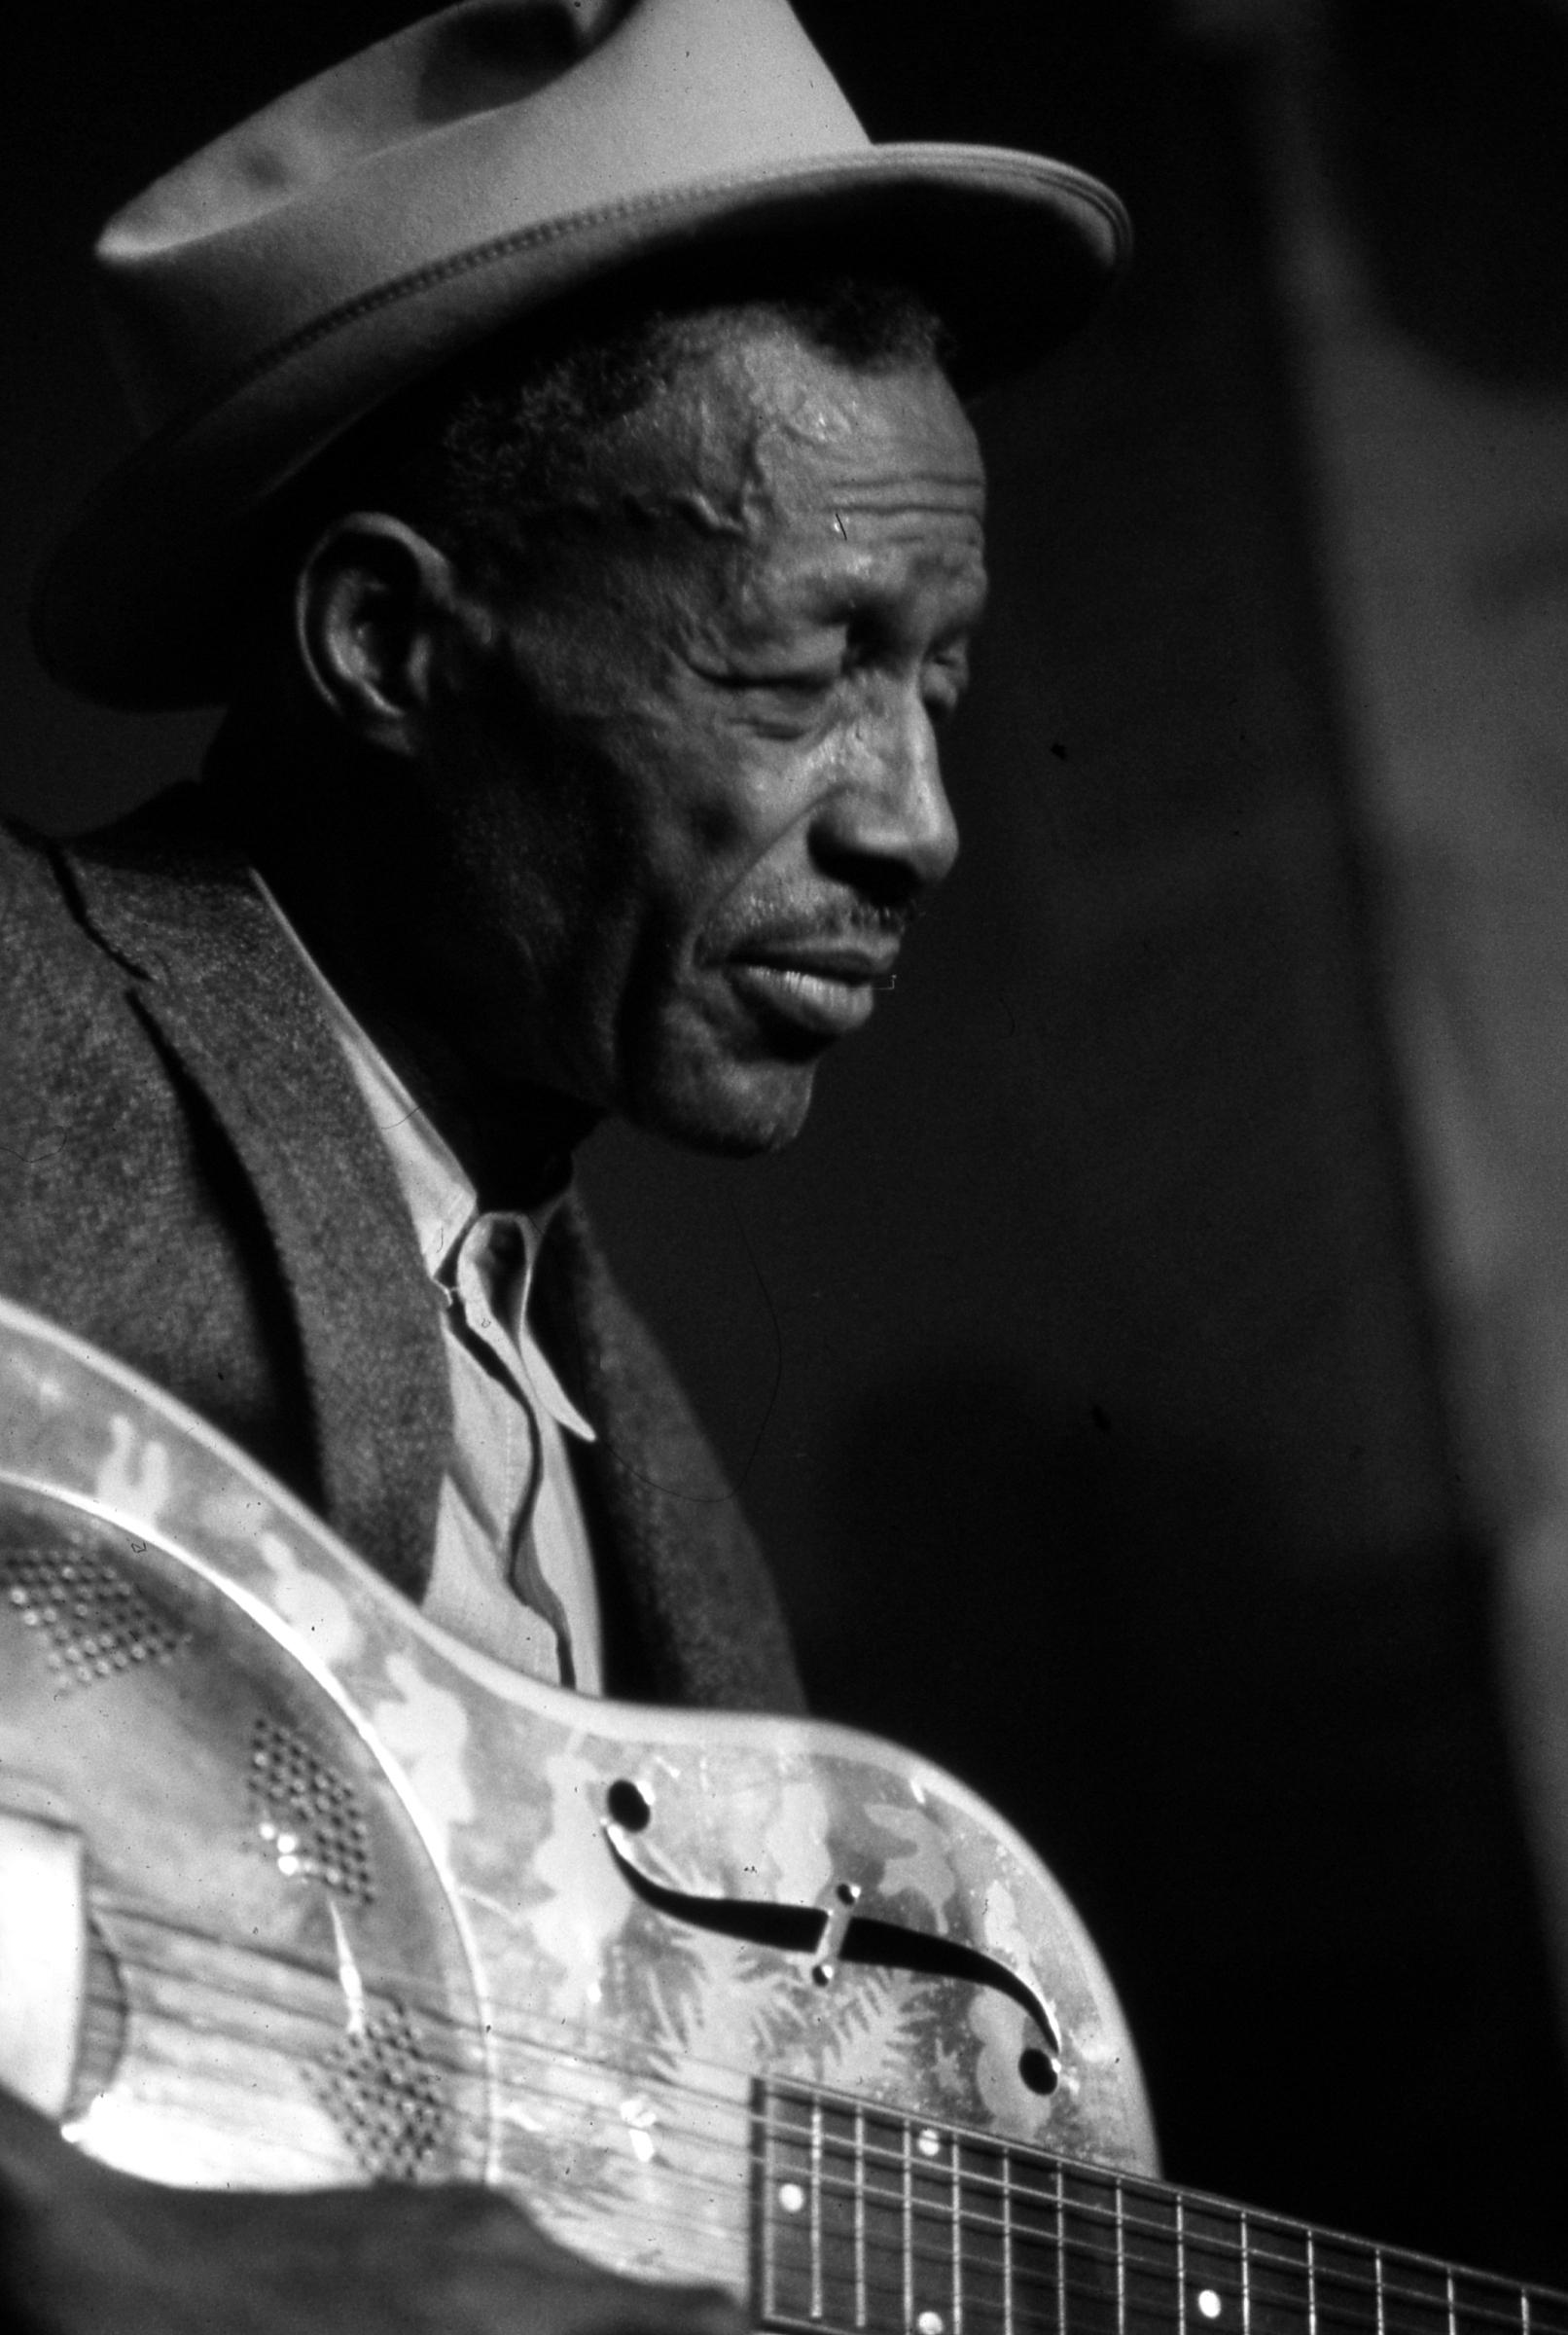 Blind Lemon Jefferson - The Great Country Blues Singers